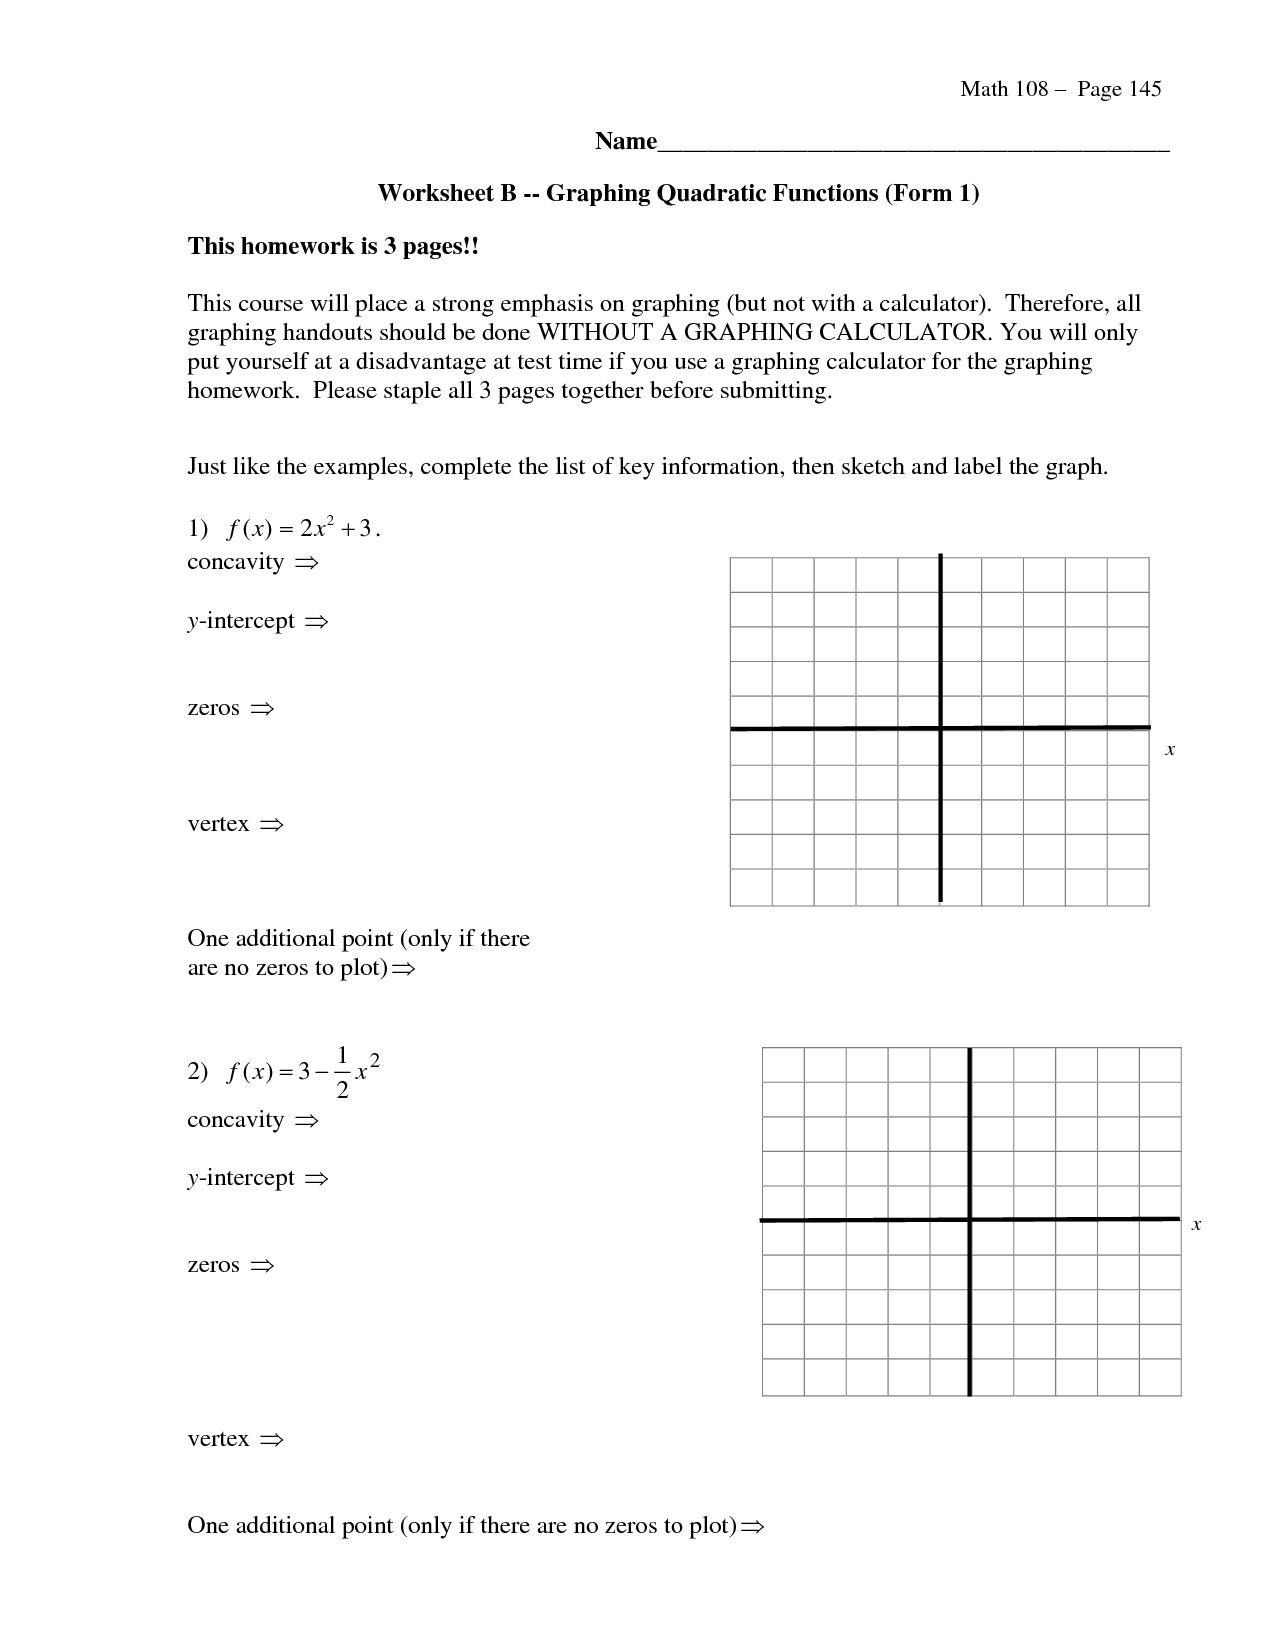 Graphing Parabolas In Vertex Form Worksheet   db excel.com